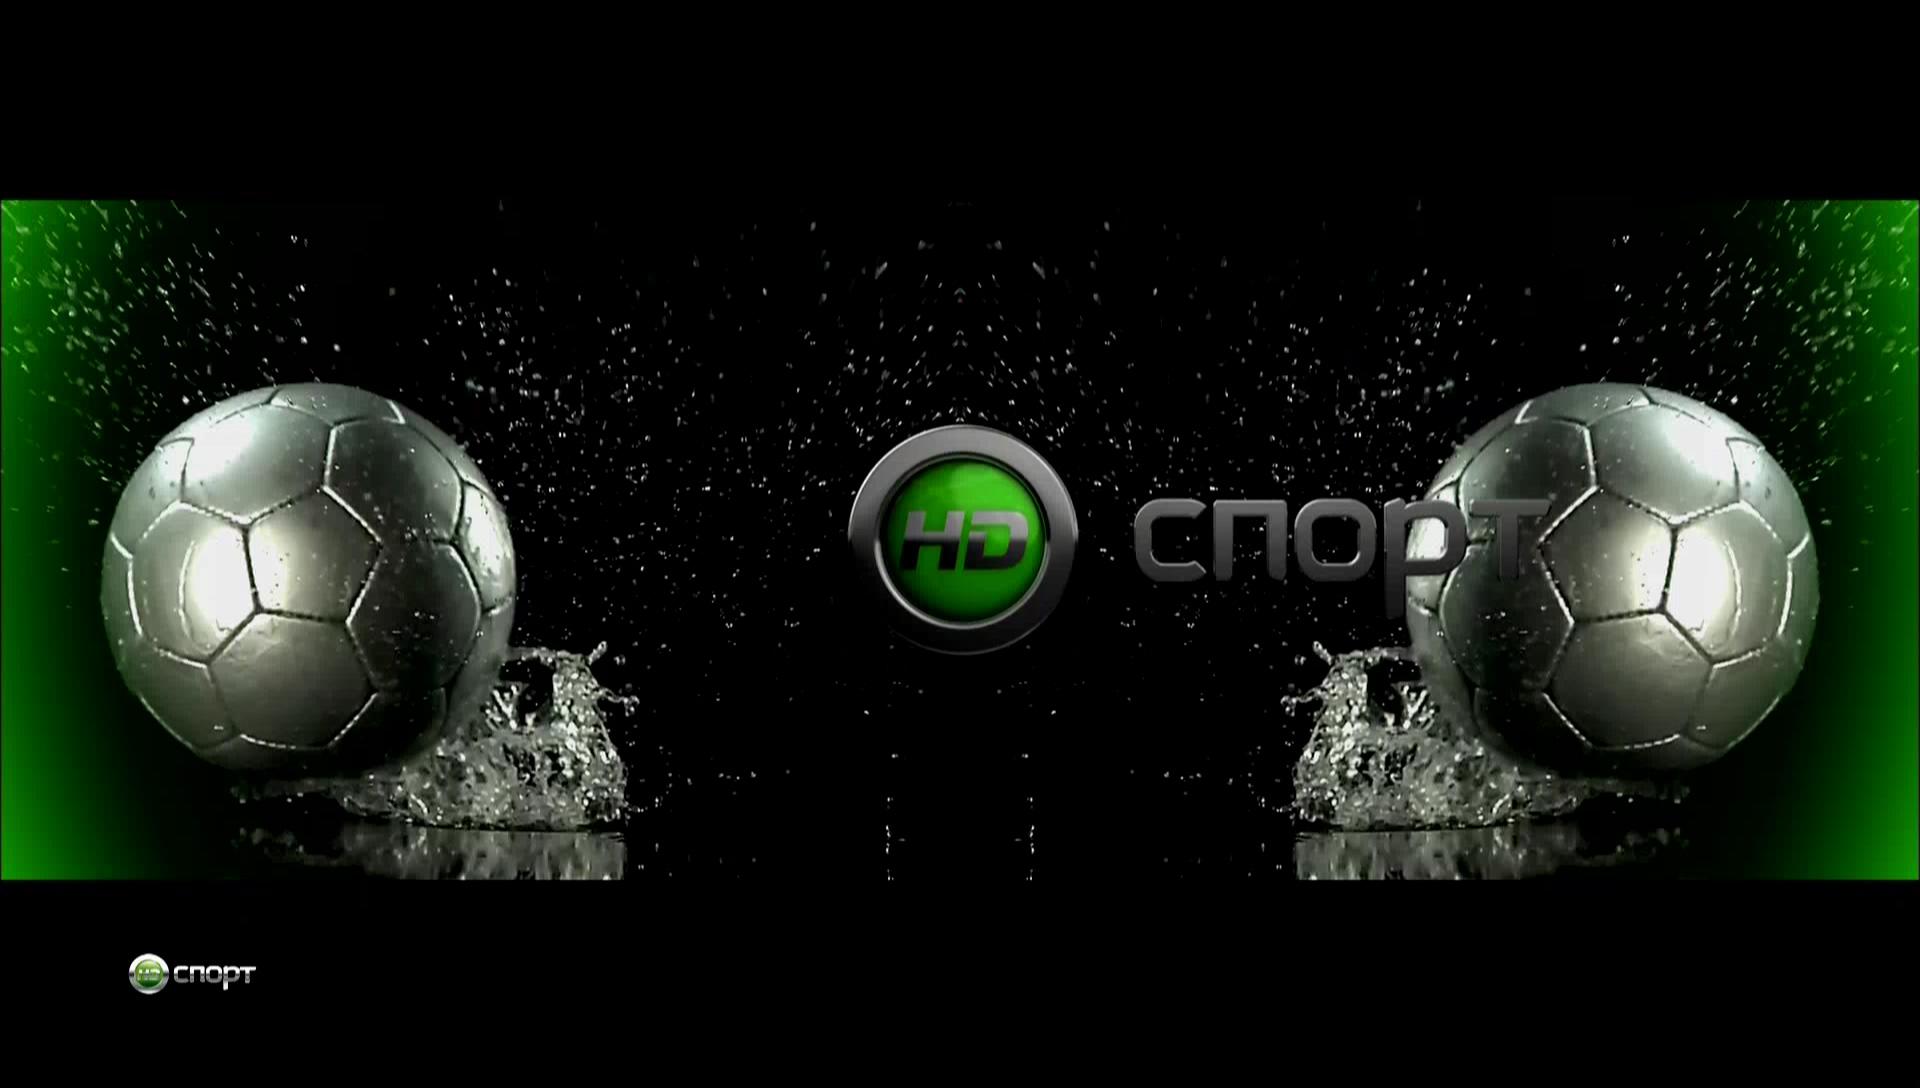 Спутниковые каналы телеканалы нтв онлайн бесплатно 16 фотография